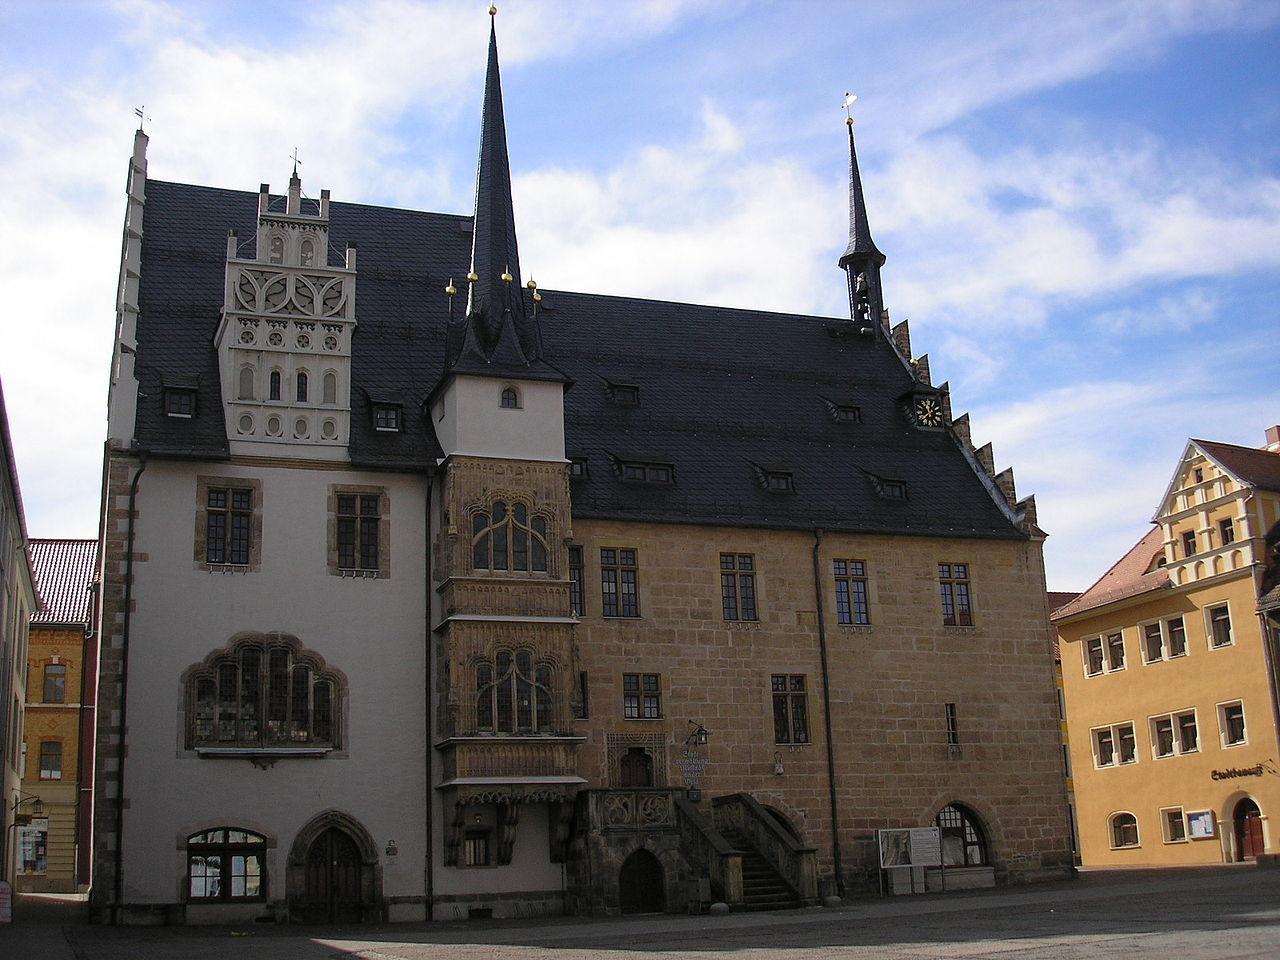 1280px-Rathaus_Neustadt_Orla.JPG